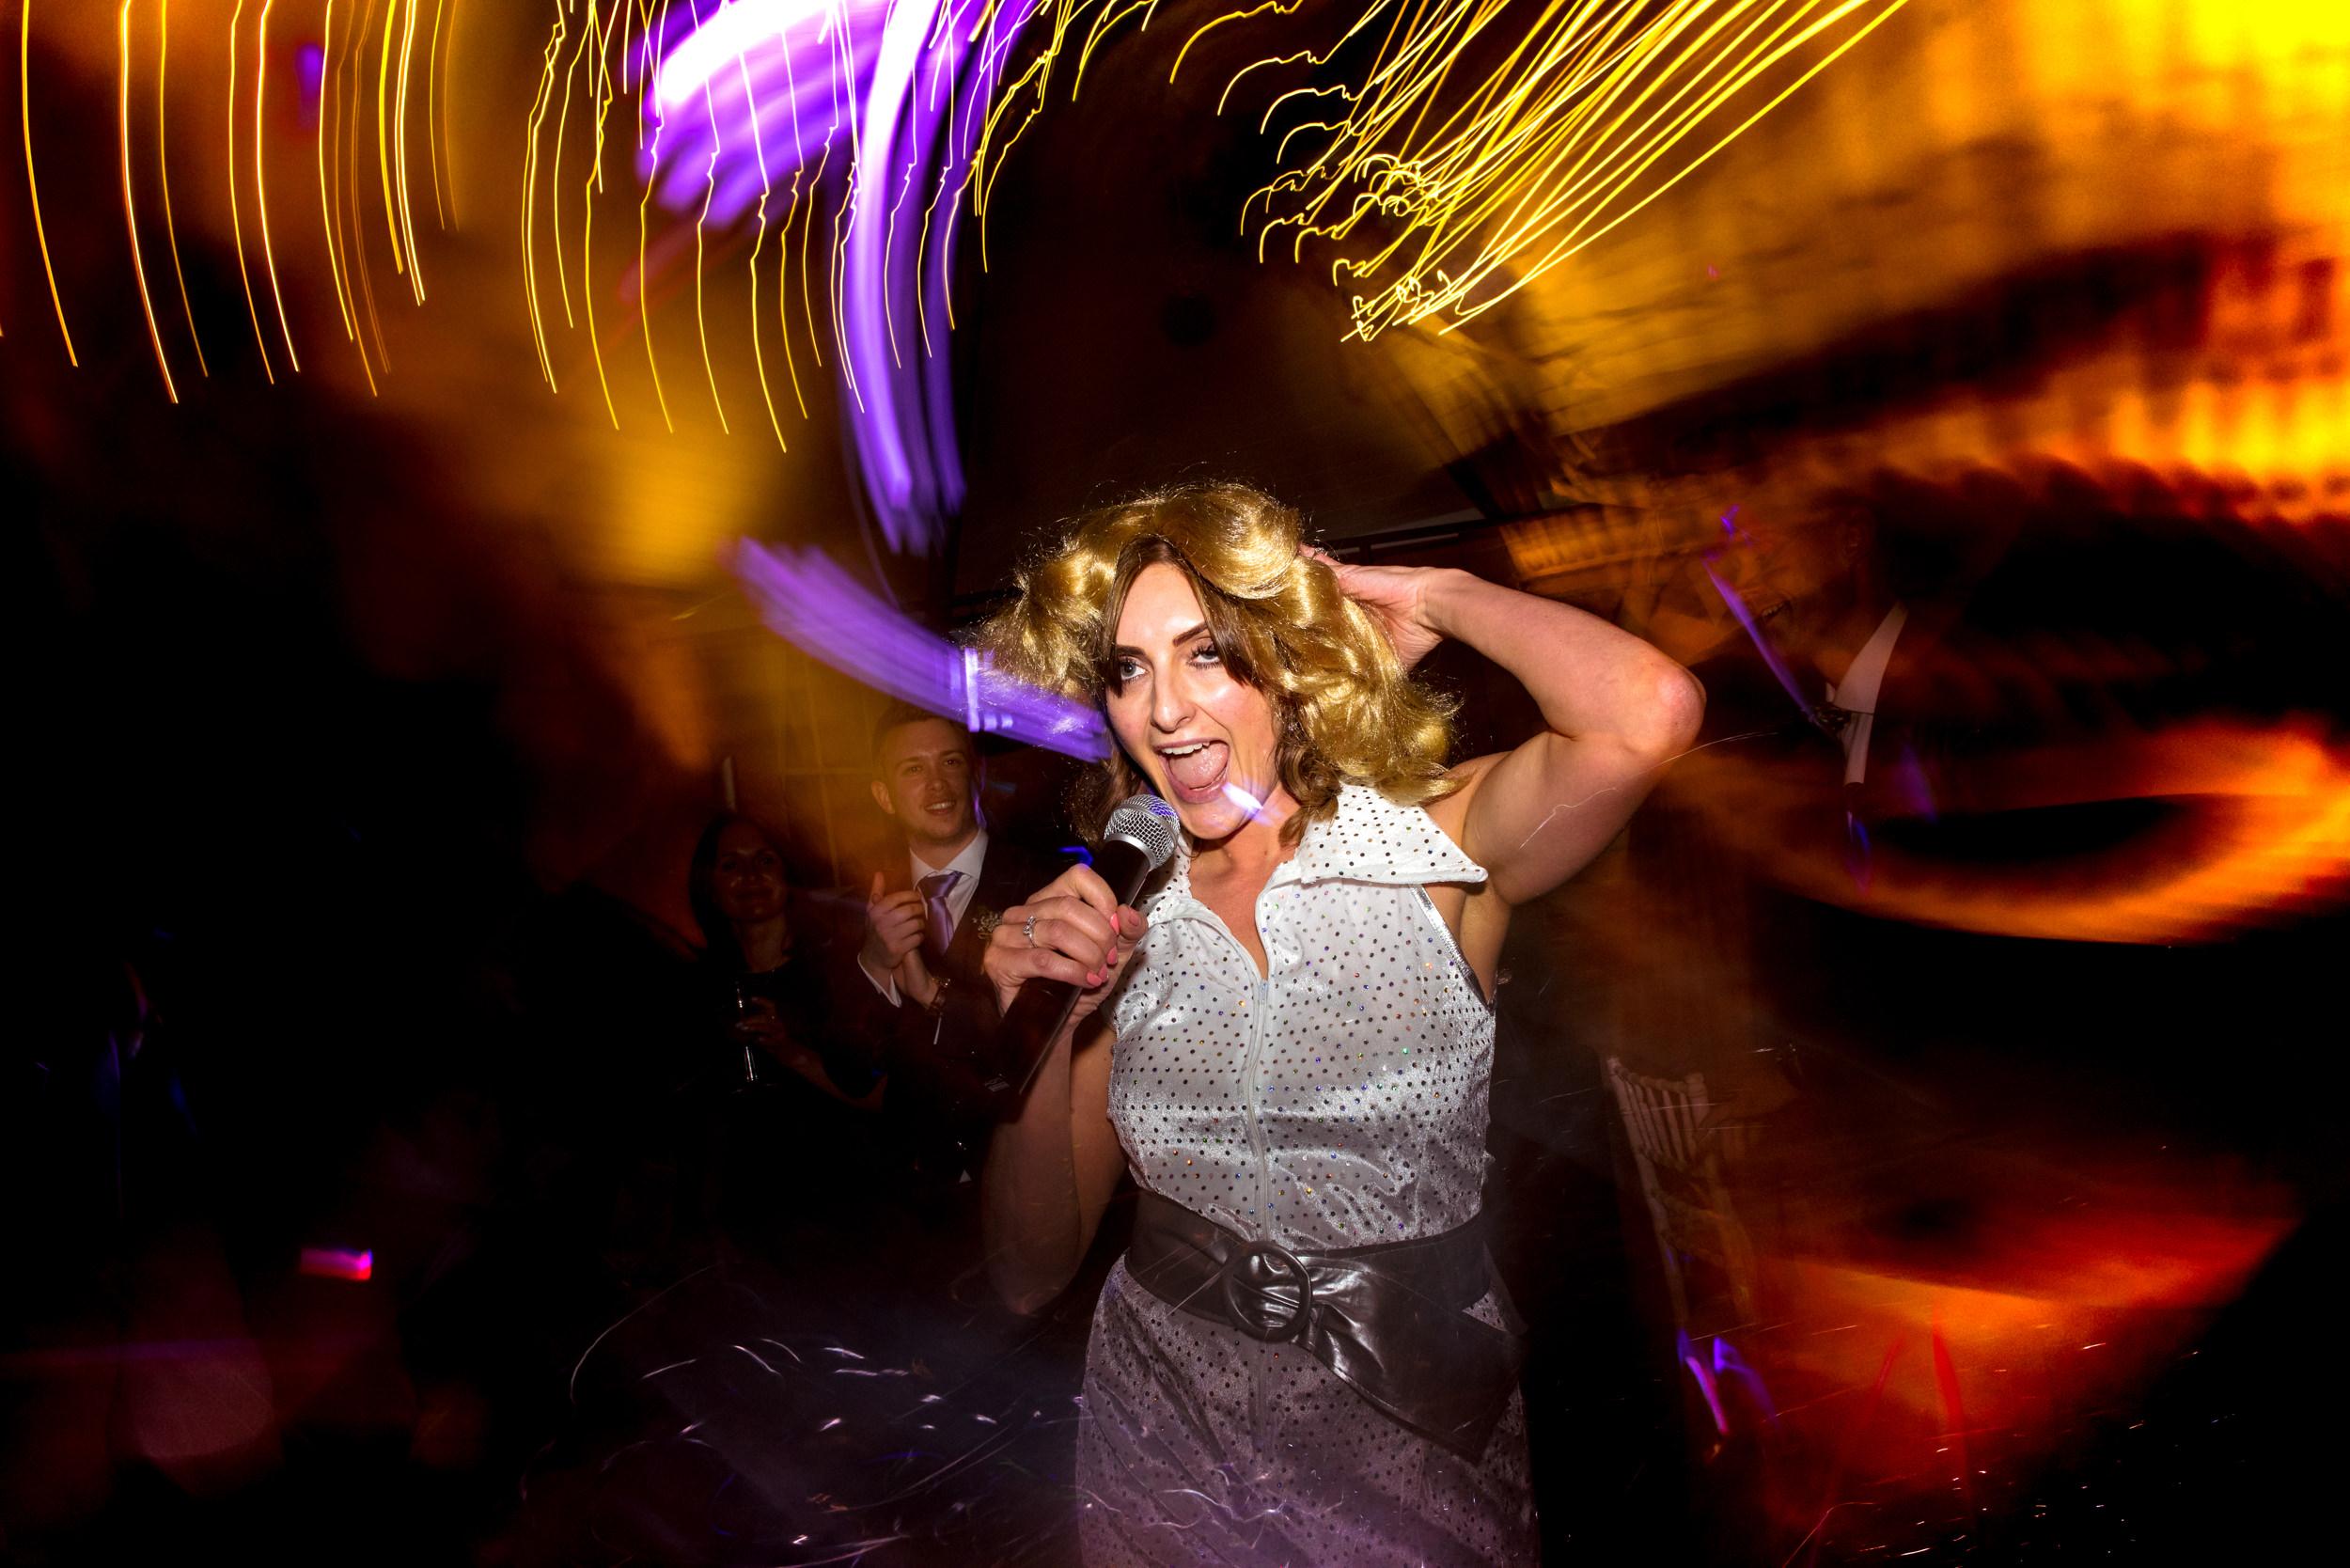 Evening wedding guest dressed as Abba on dance floor